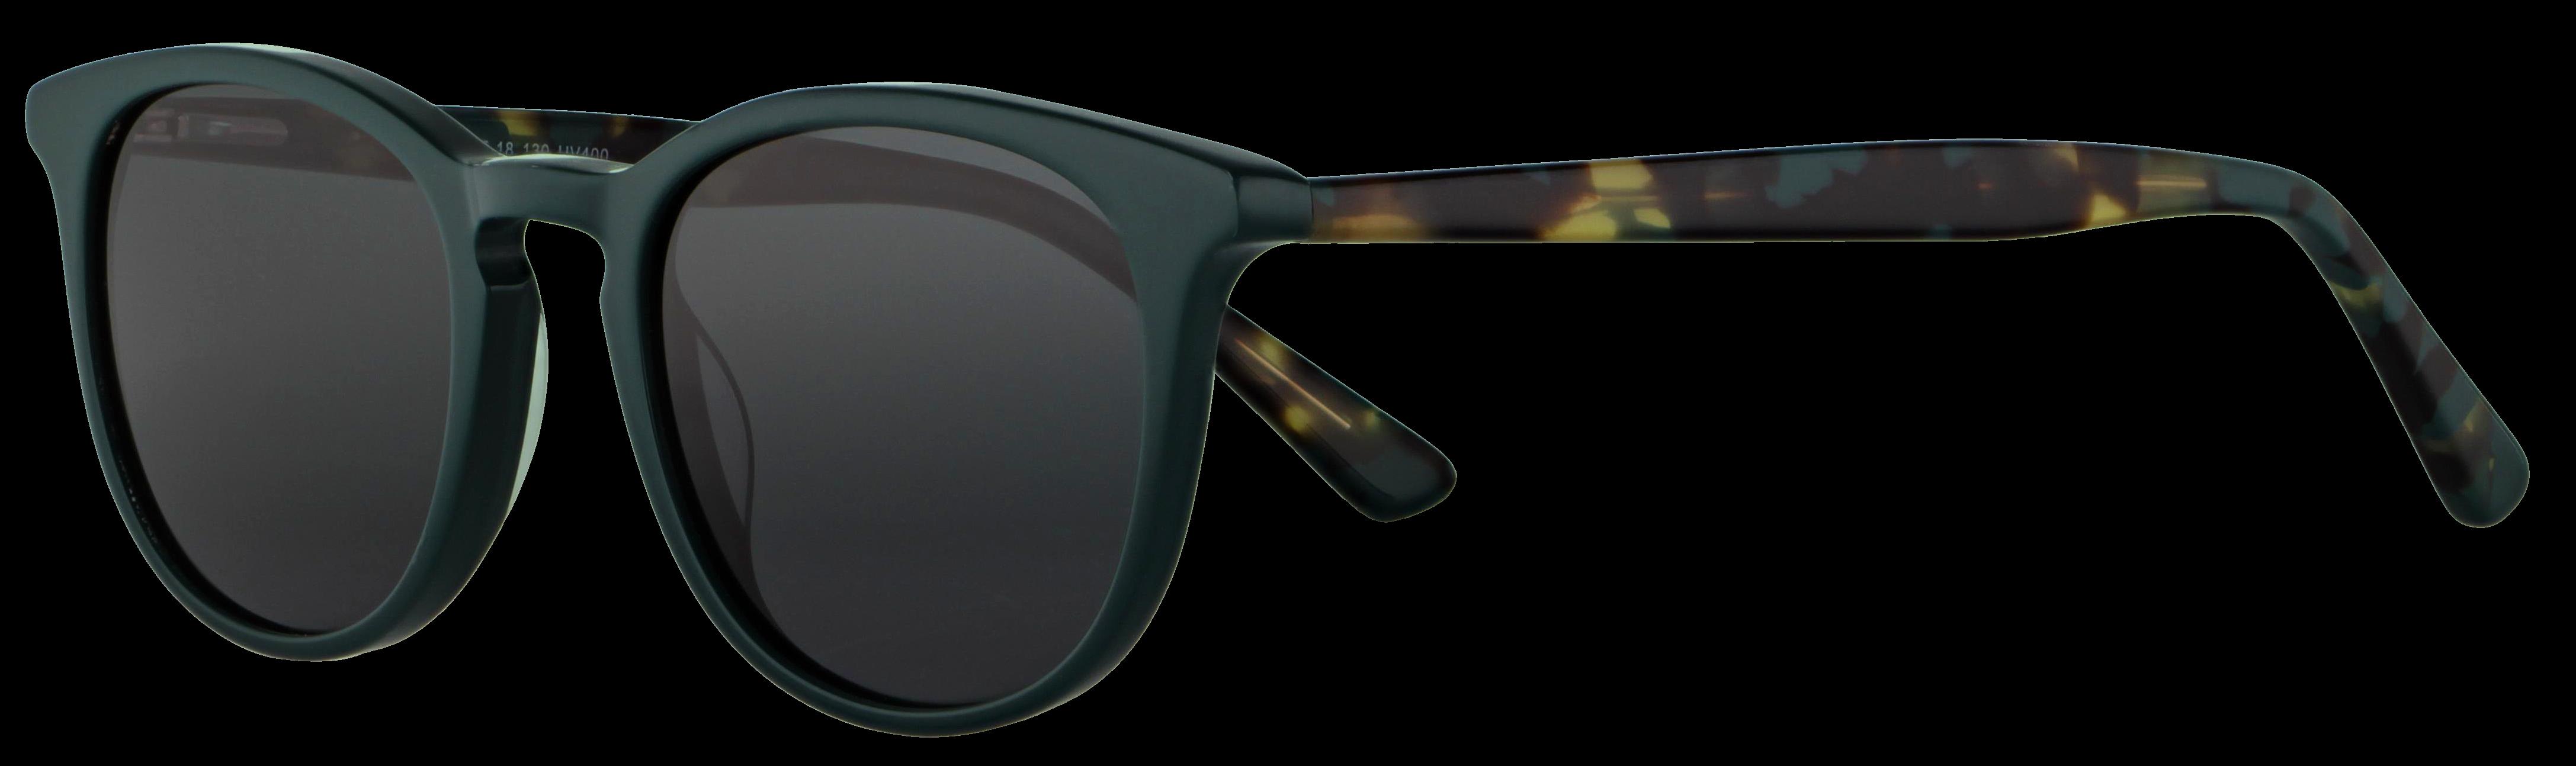 abele optik Kindersonnenbrille 717881